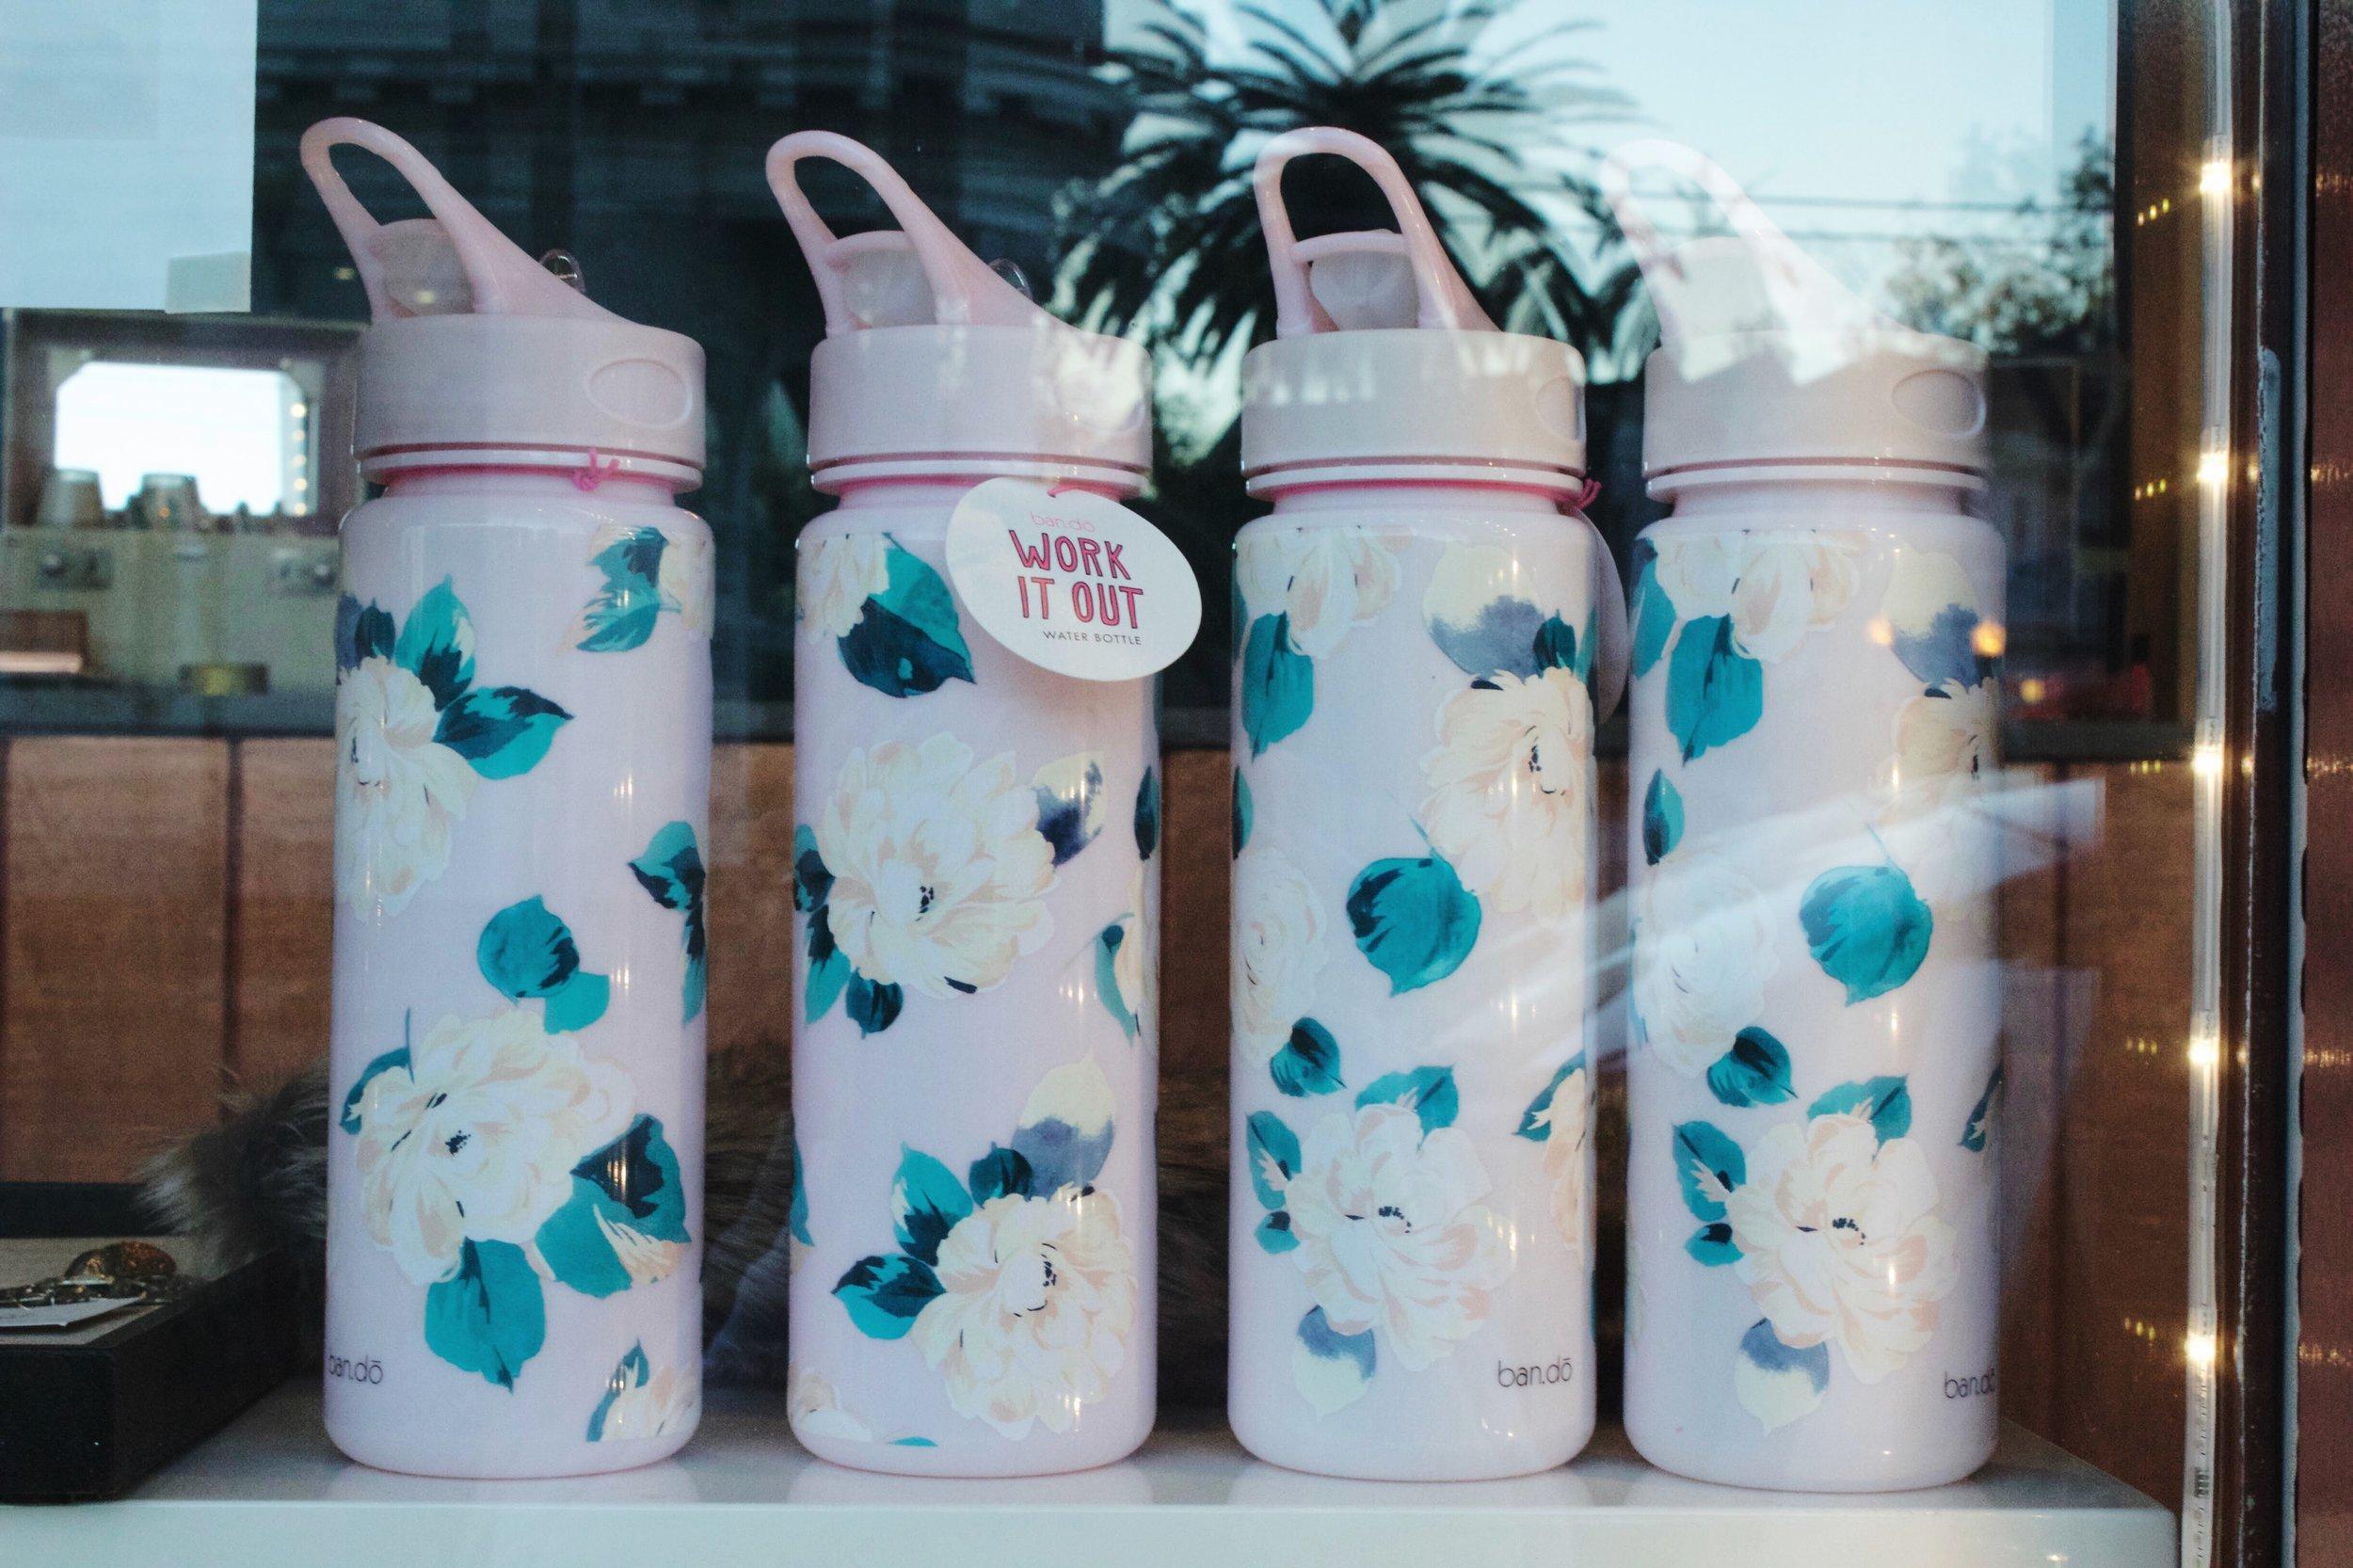 Bands Water bottles DAMAS Oak Park California